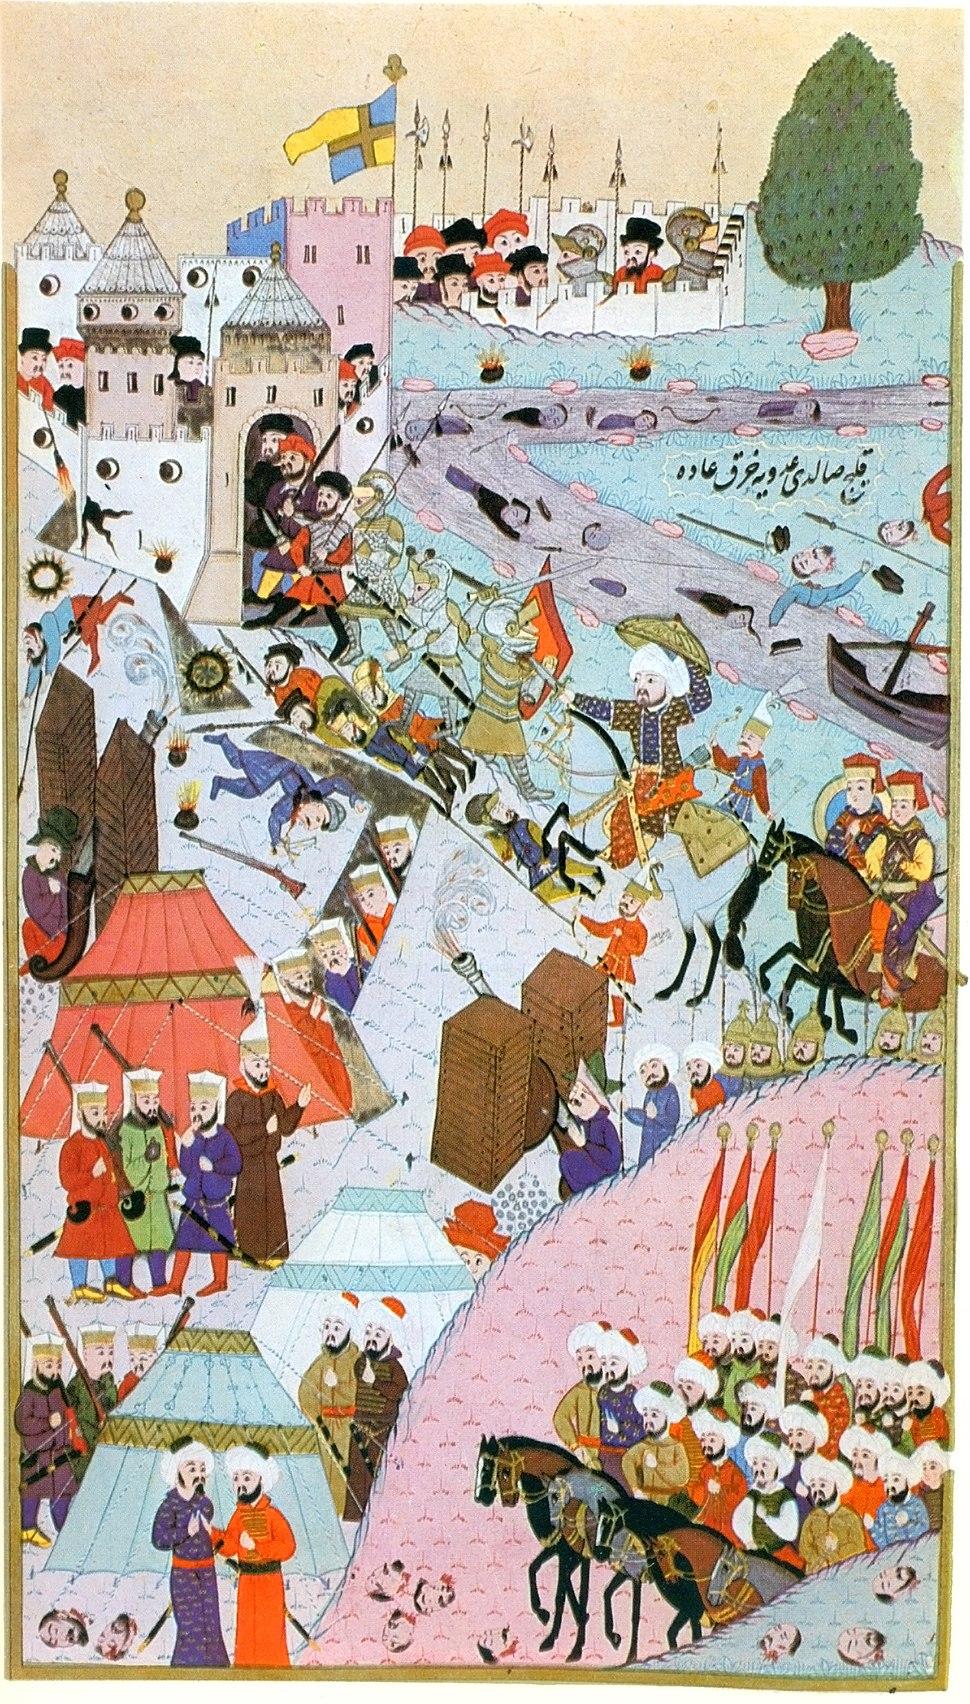 Siege of Belgrade (N%C3%A1ndorfeh%C3%A9rv%C3%A1r) 1456